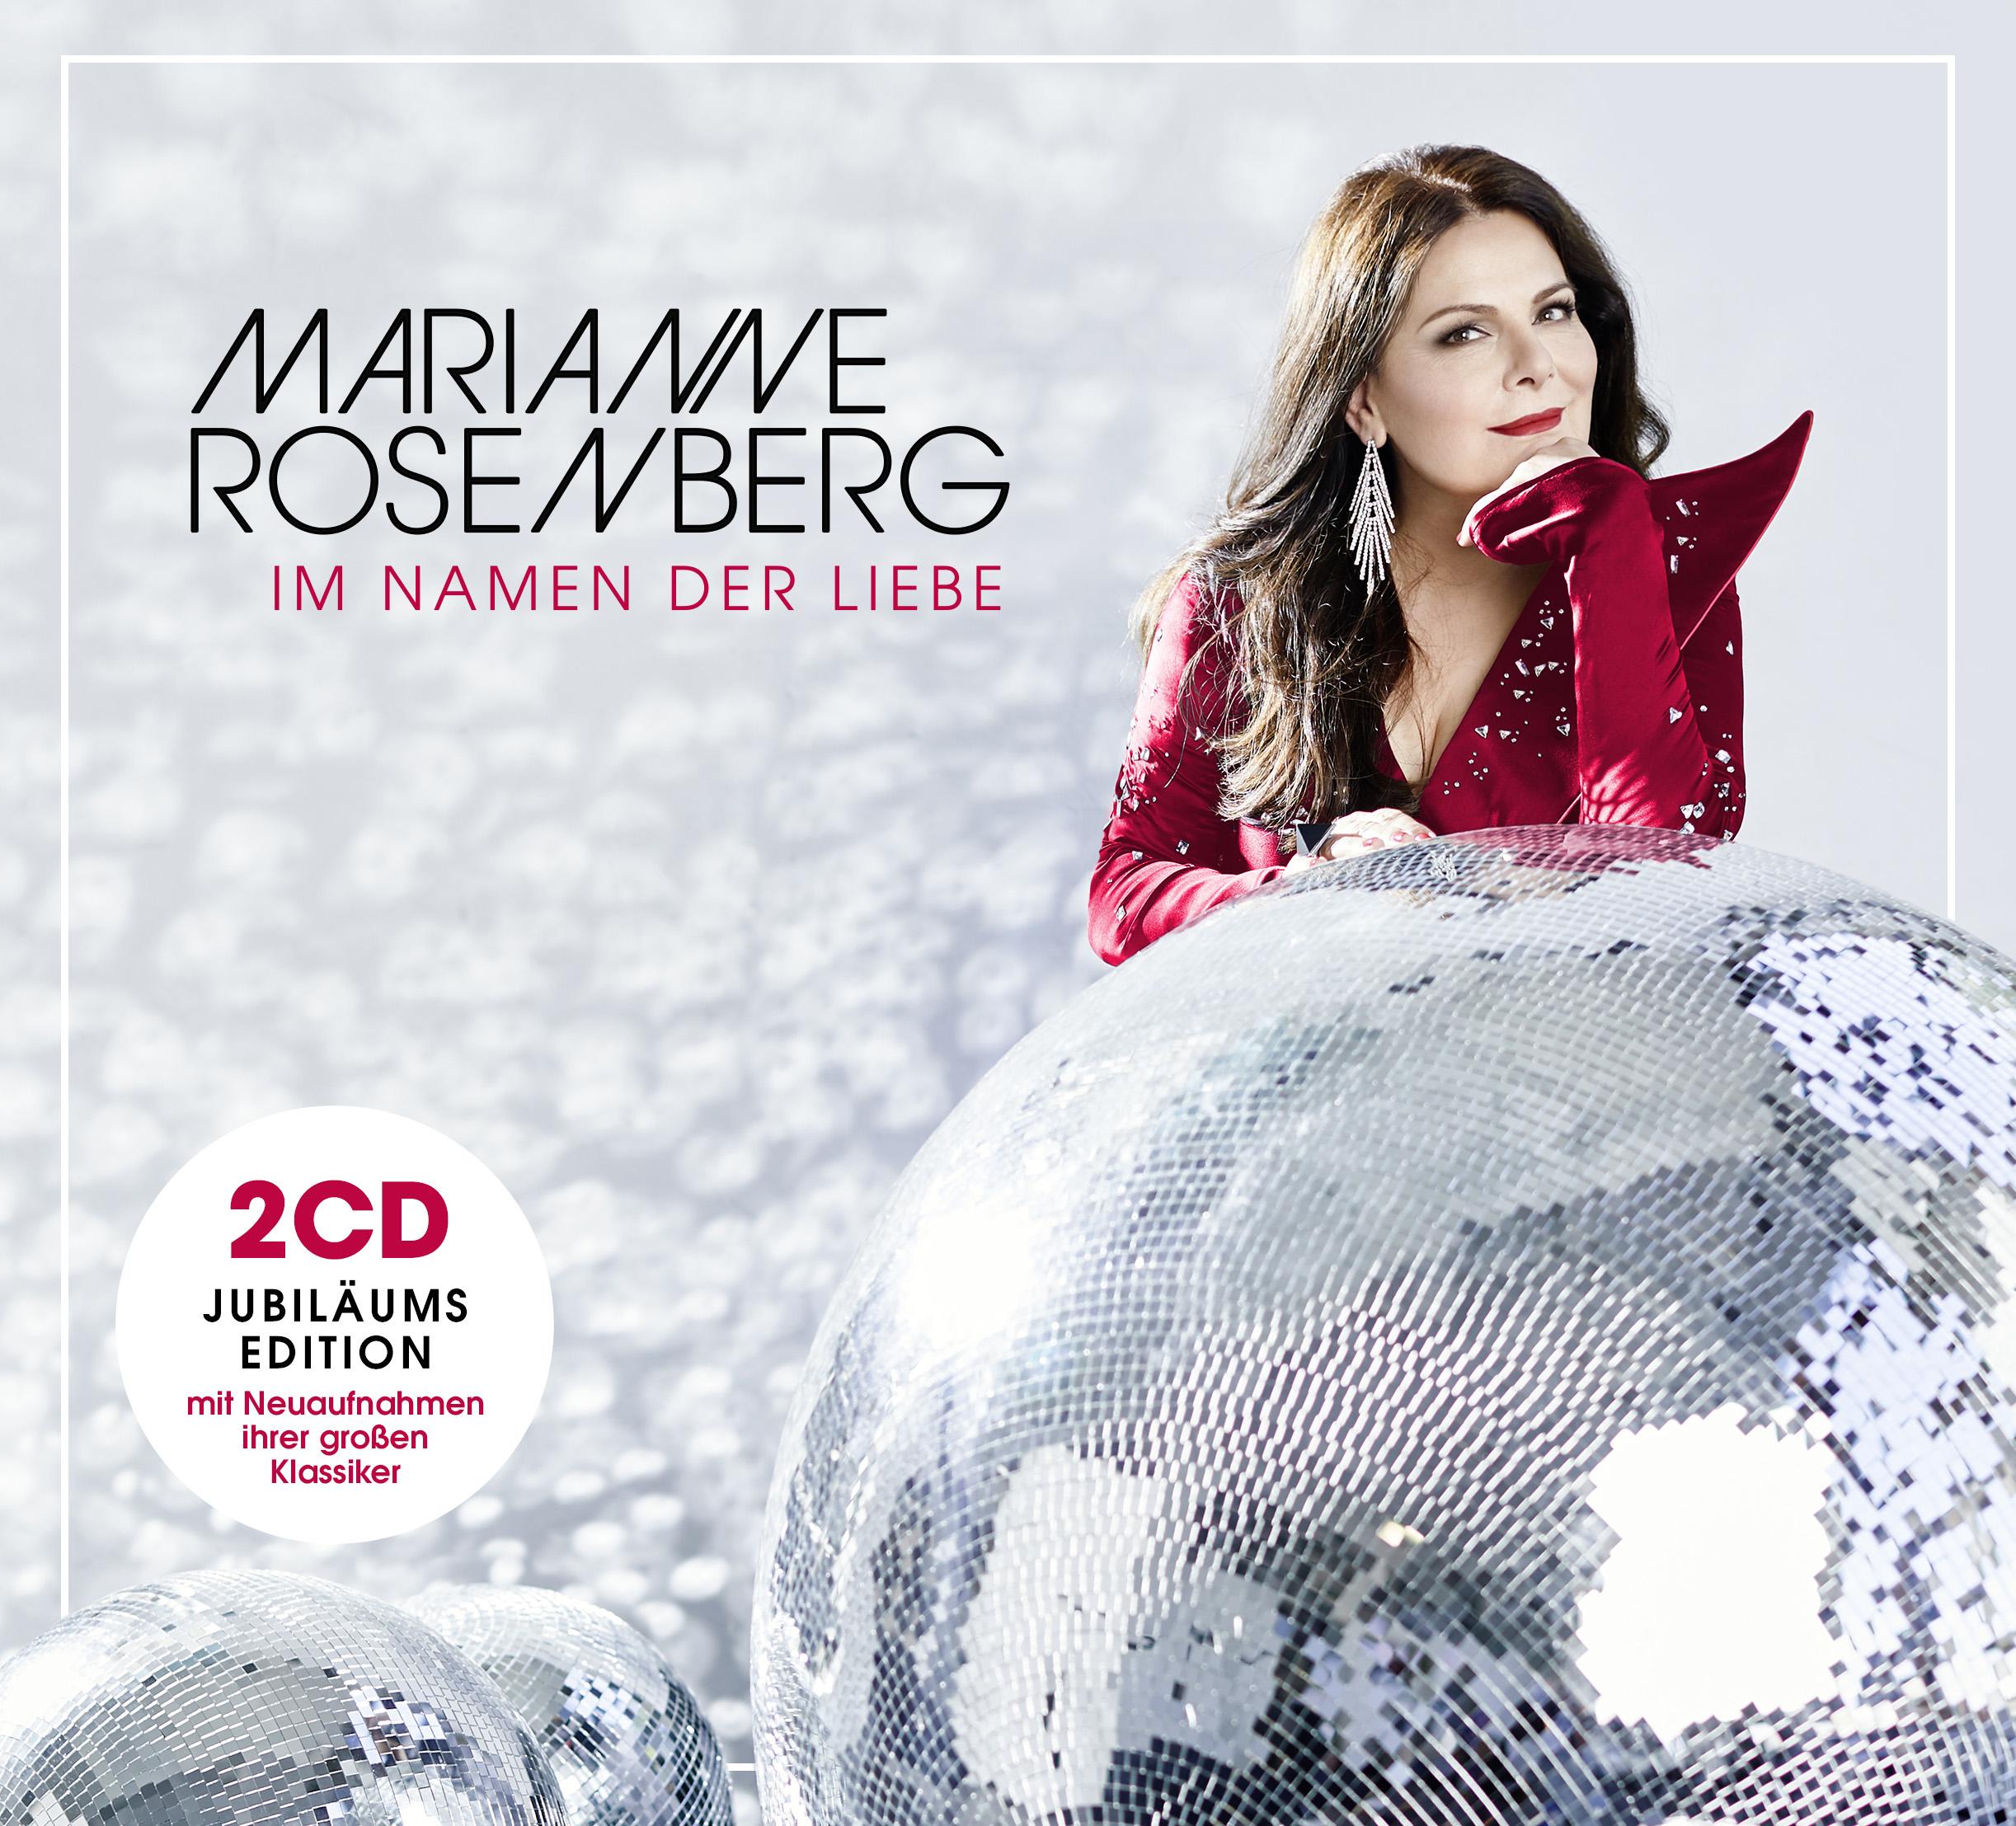 MARIANNE ROSENBERG * Im Namen der Liebe (Jubiläums-Edition)  (Doppel-CD)